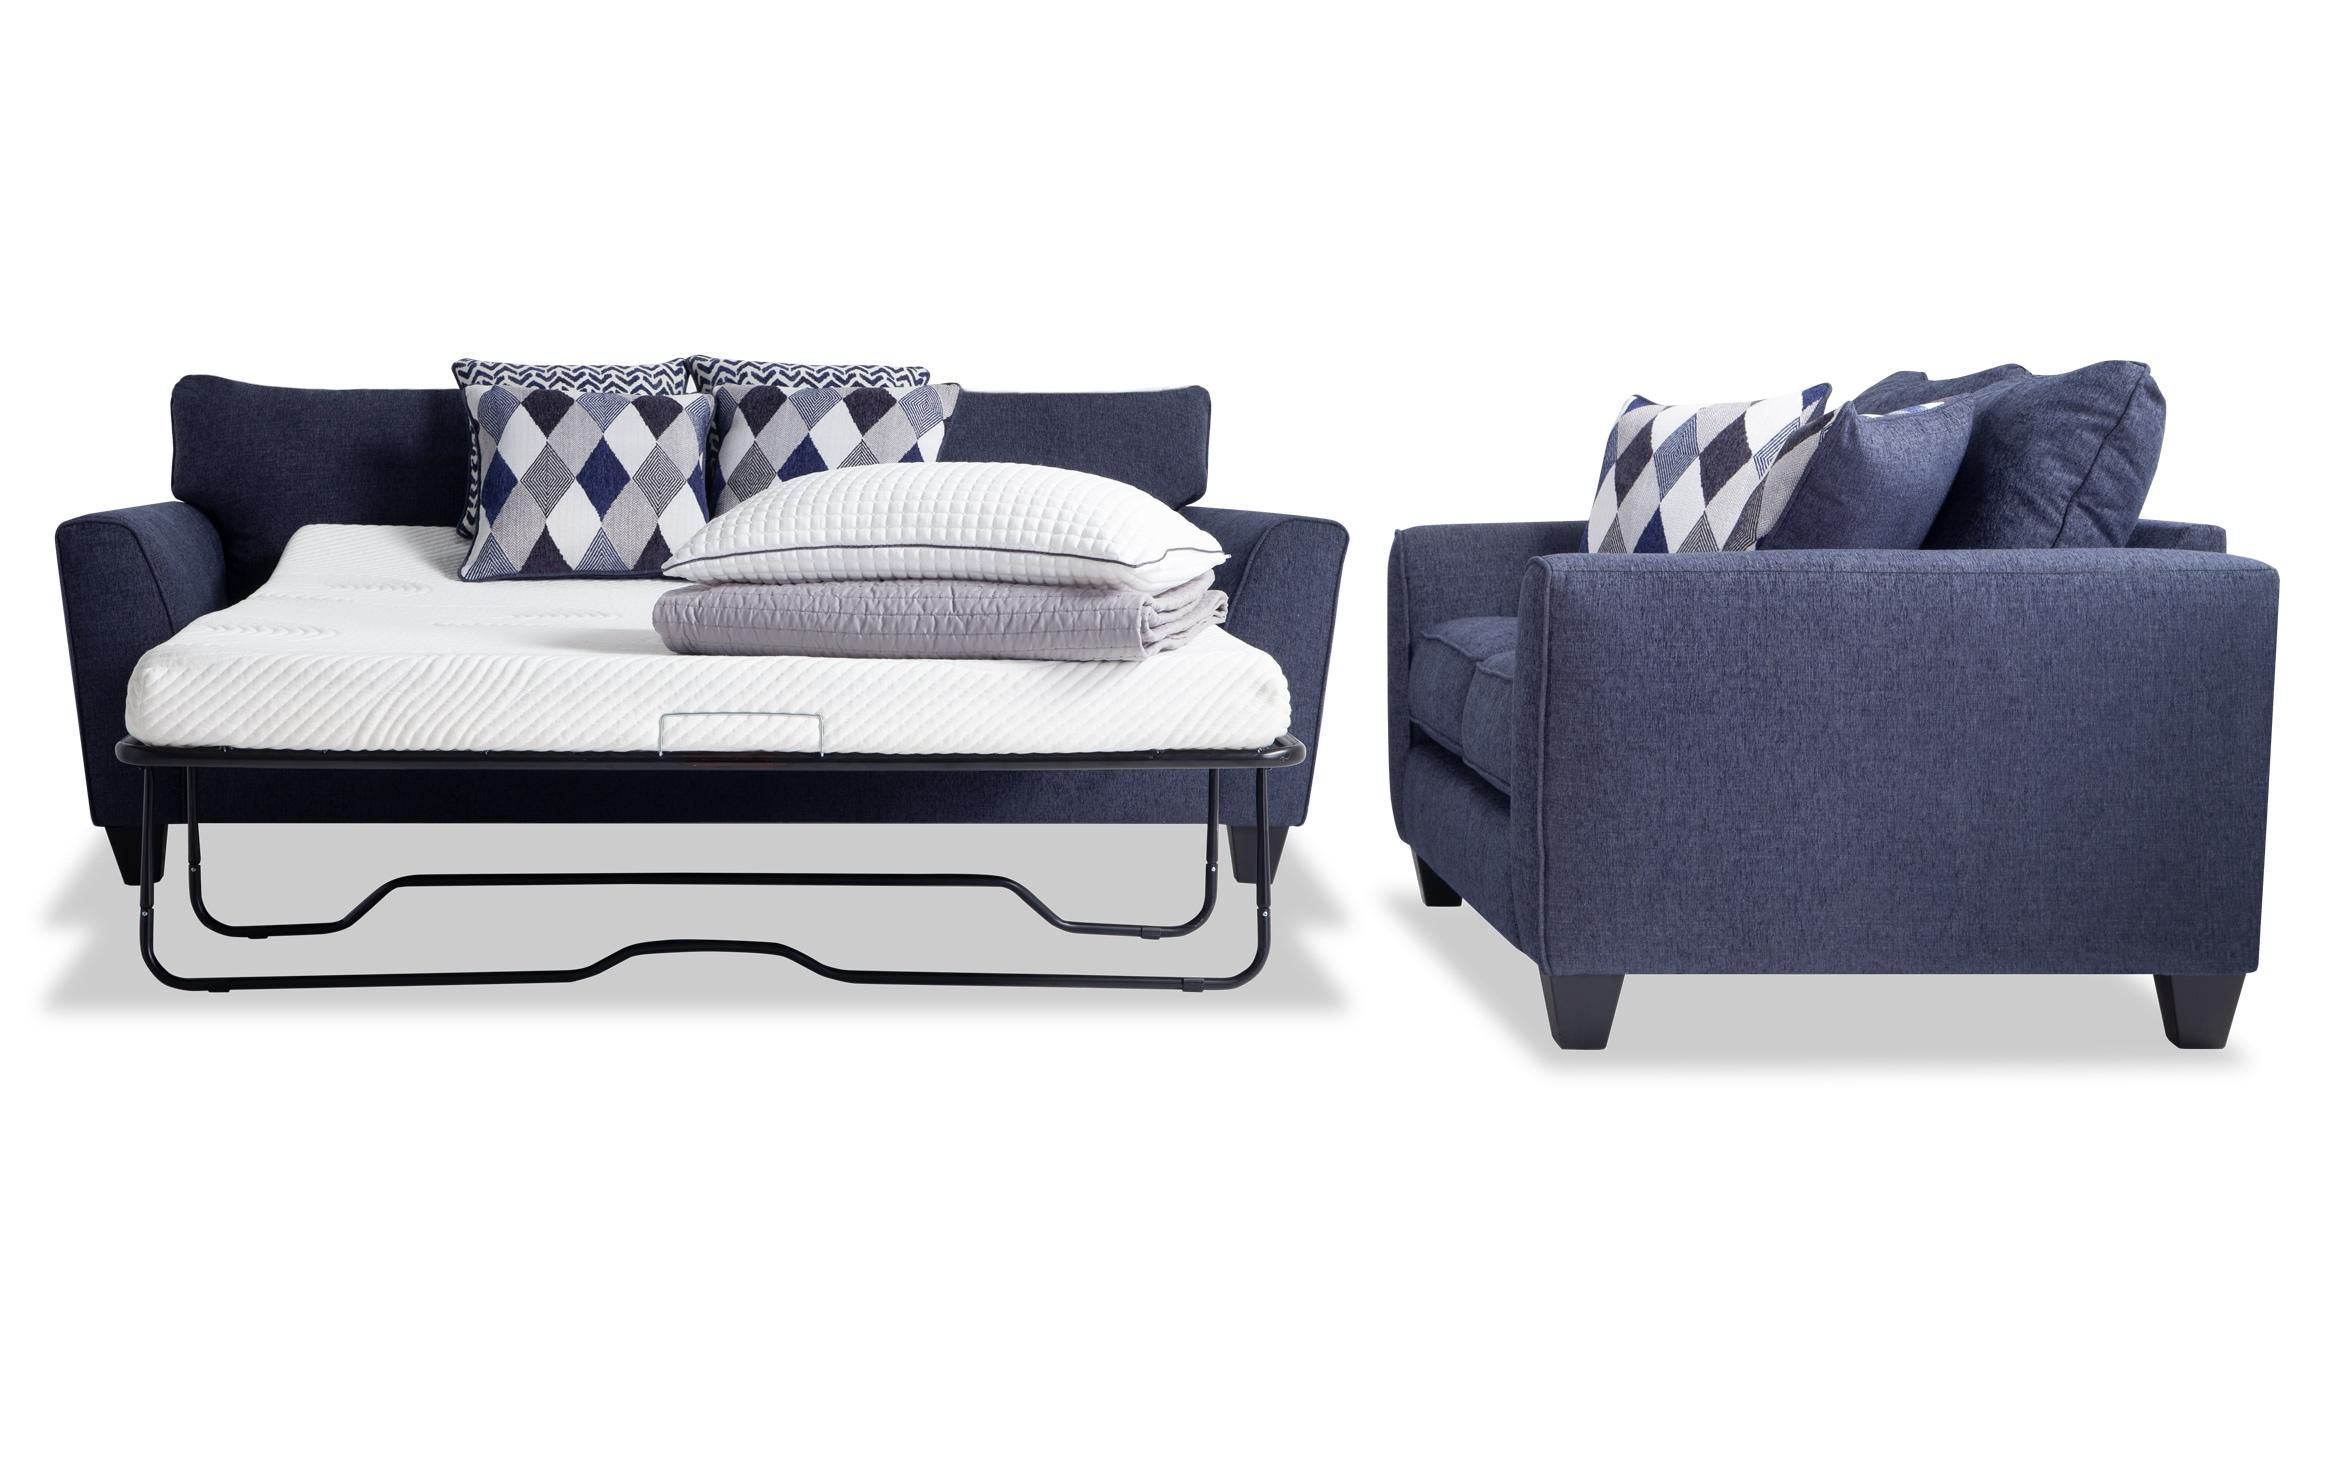 Picture of: Capri Denim Bob O Pedic Queen Sleeper Sofa Loveseat Bobs Com